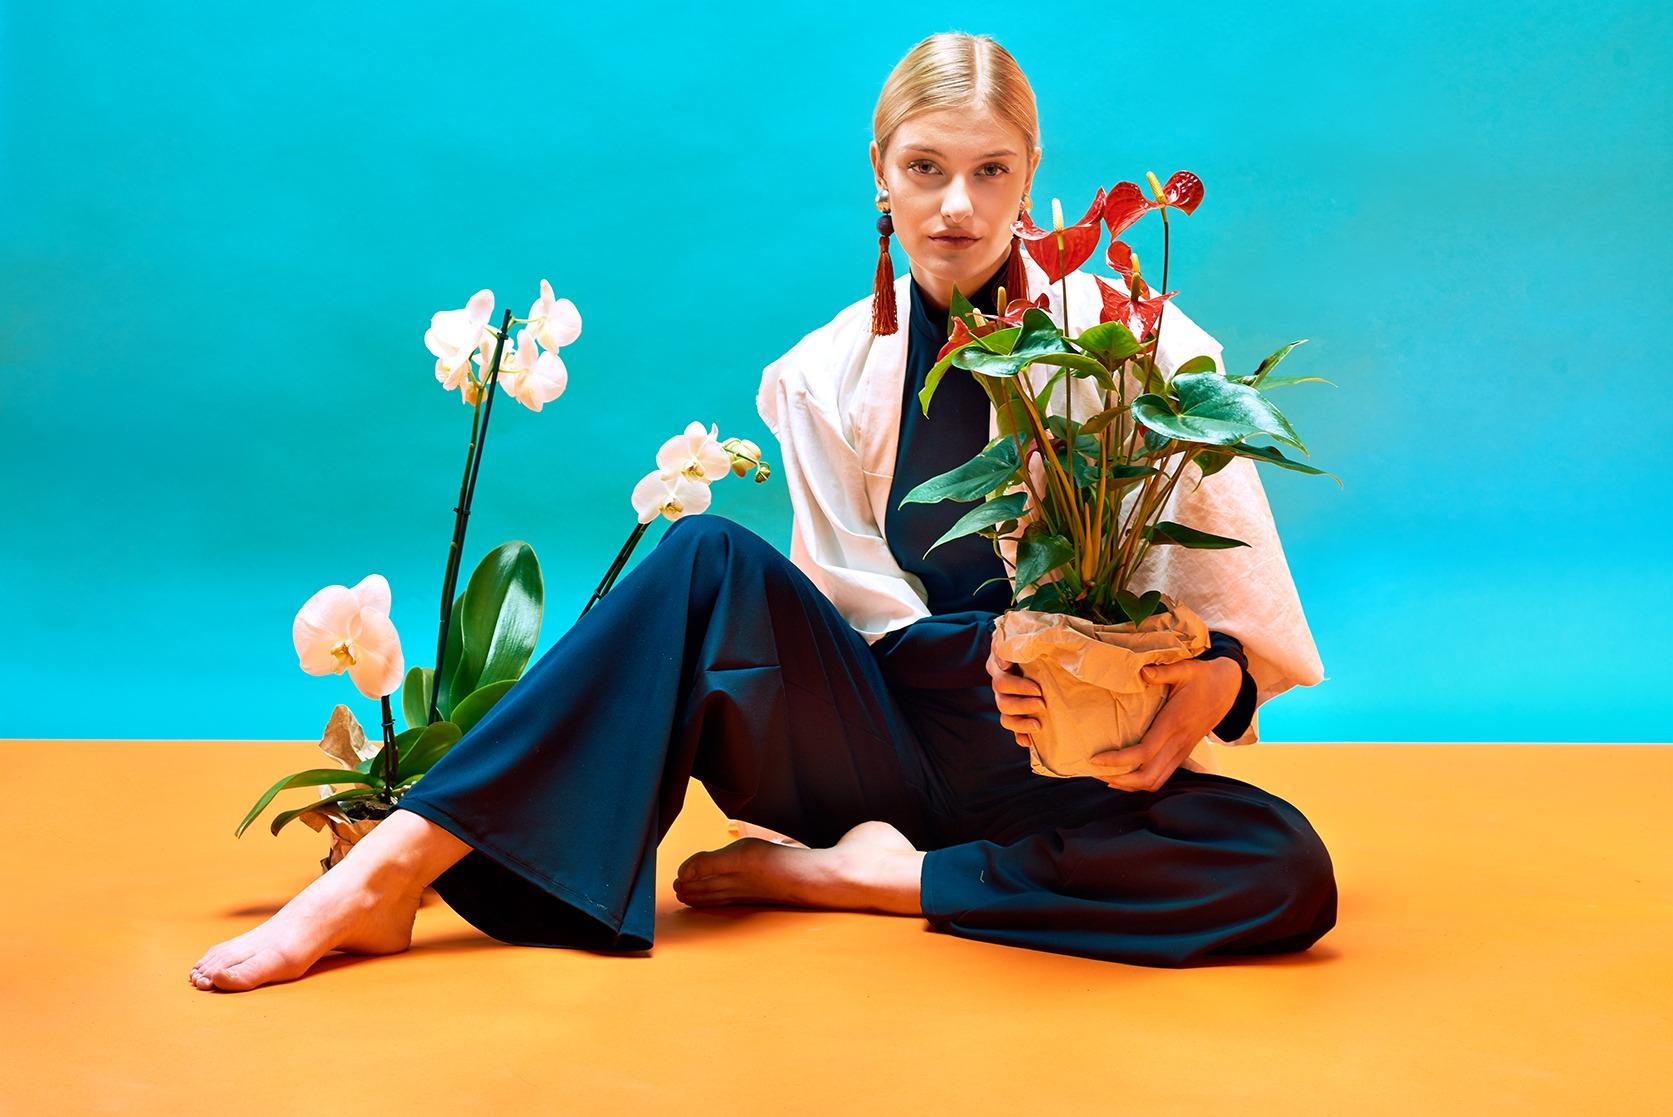 Modefotografie straubmuellerstudios Stuttgart frau sitzend